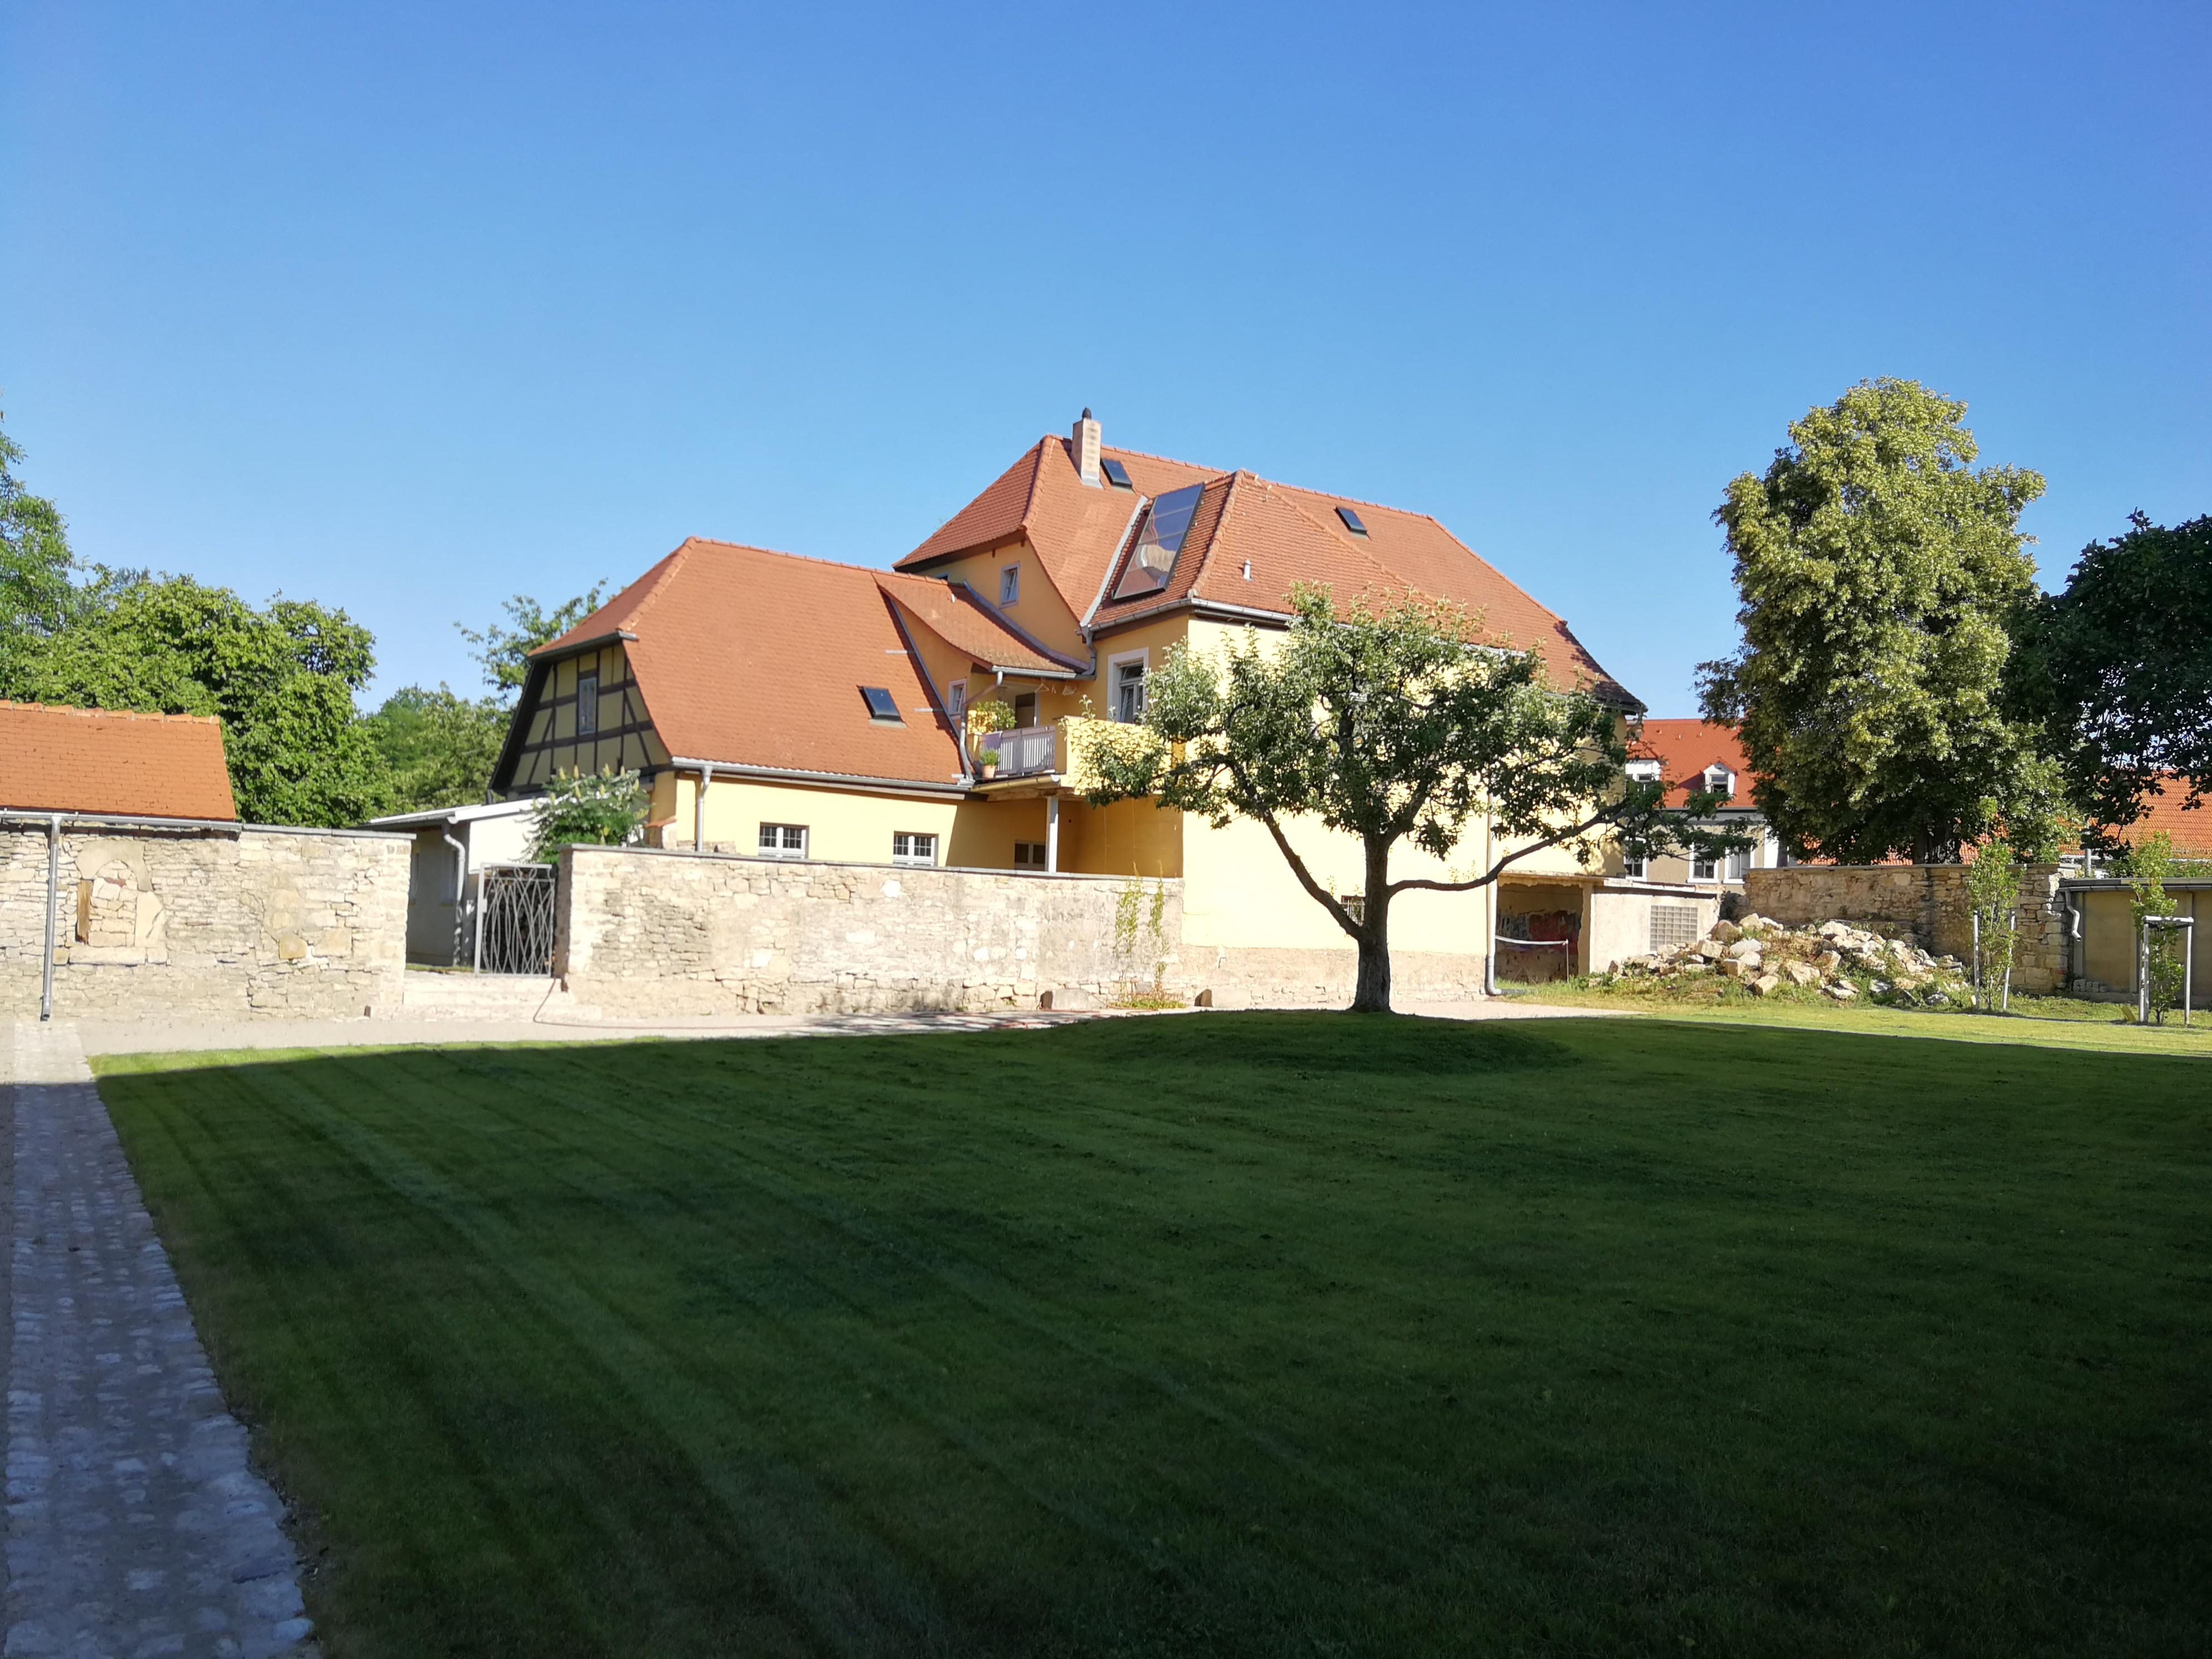 Nonnengarten in Oberweimar (RAG Weimarer Land - Mittelthüringen e.V.)